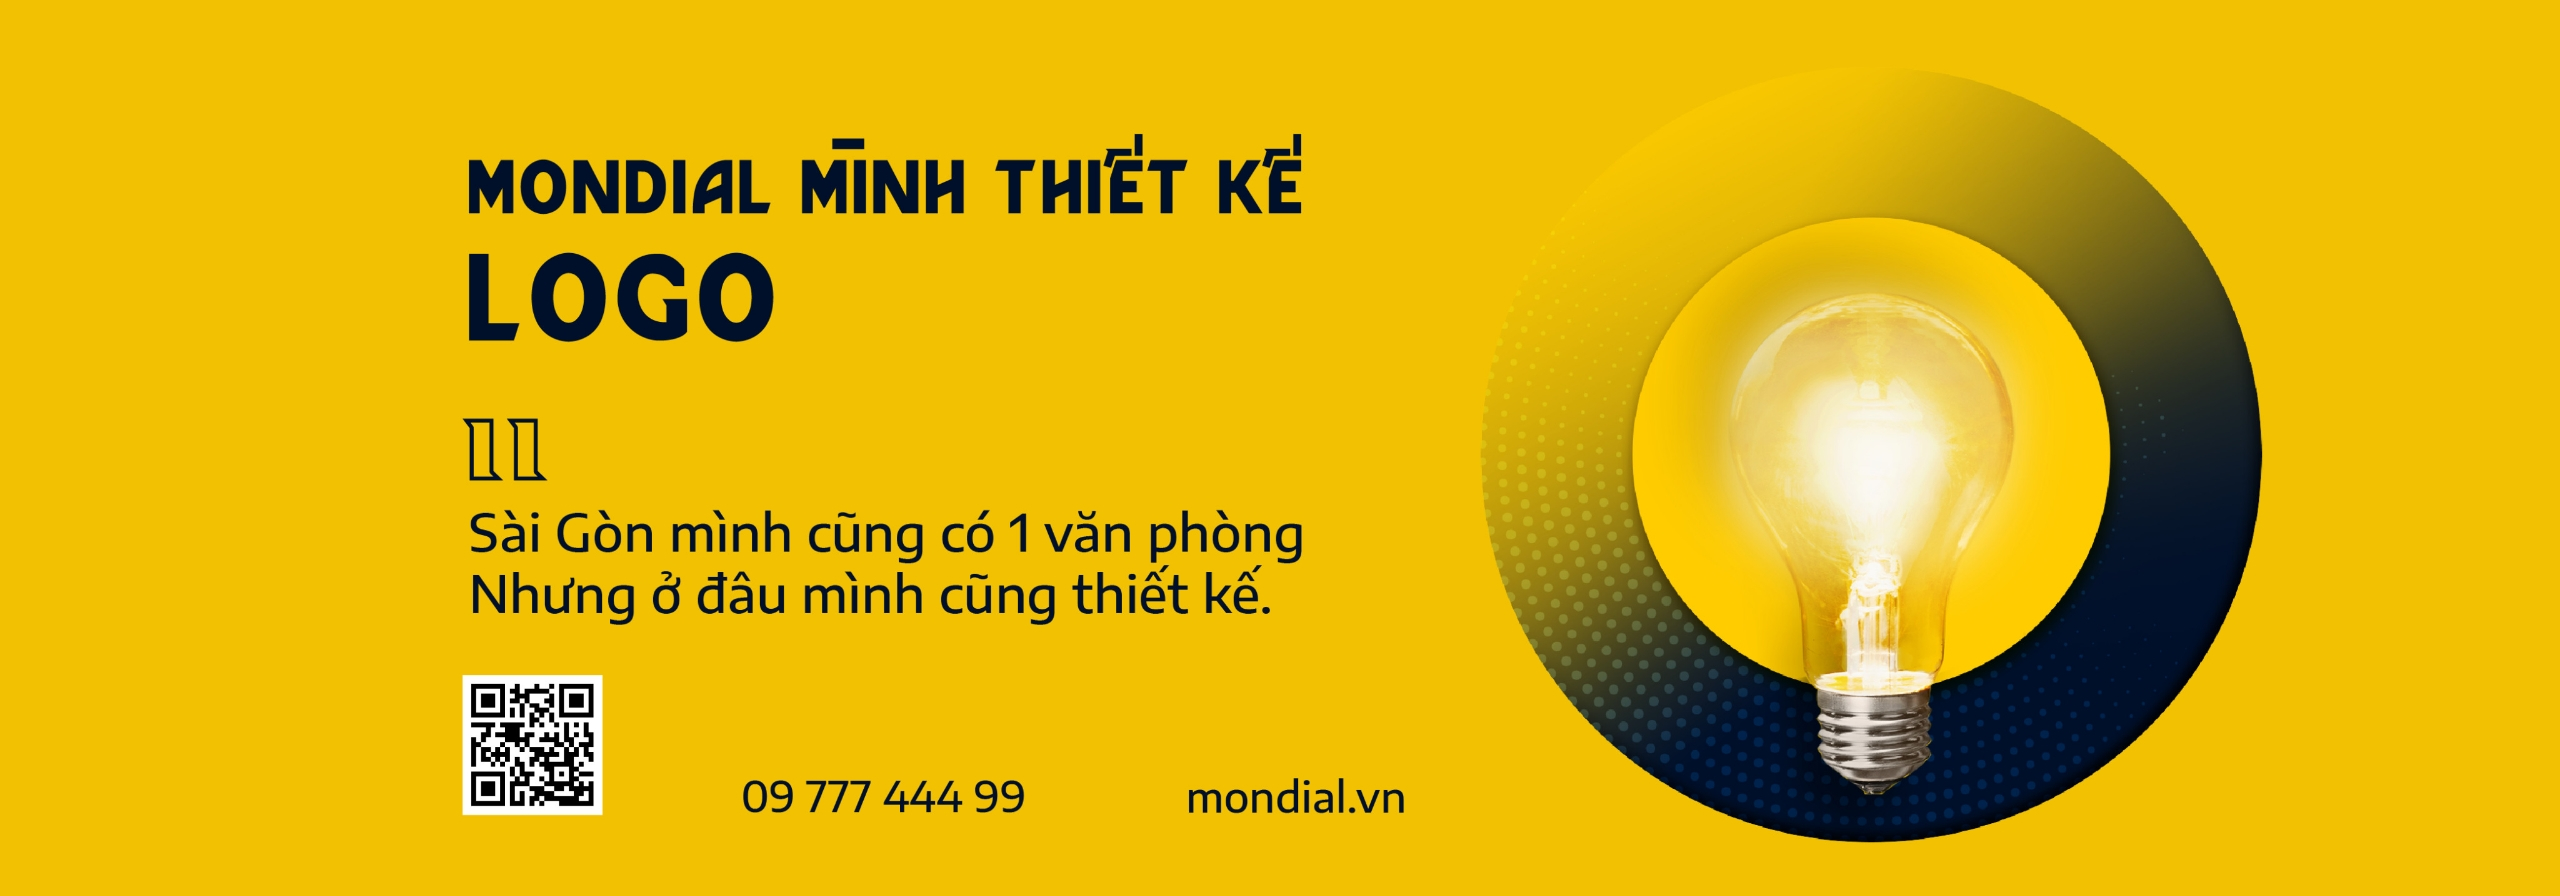 cong ty thiet ke profile Mondia (@islaquinn6962682ed) Cover Image